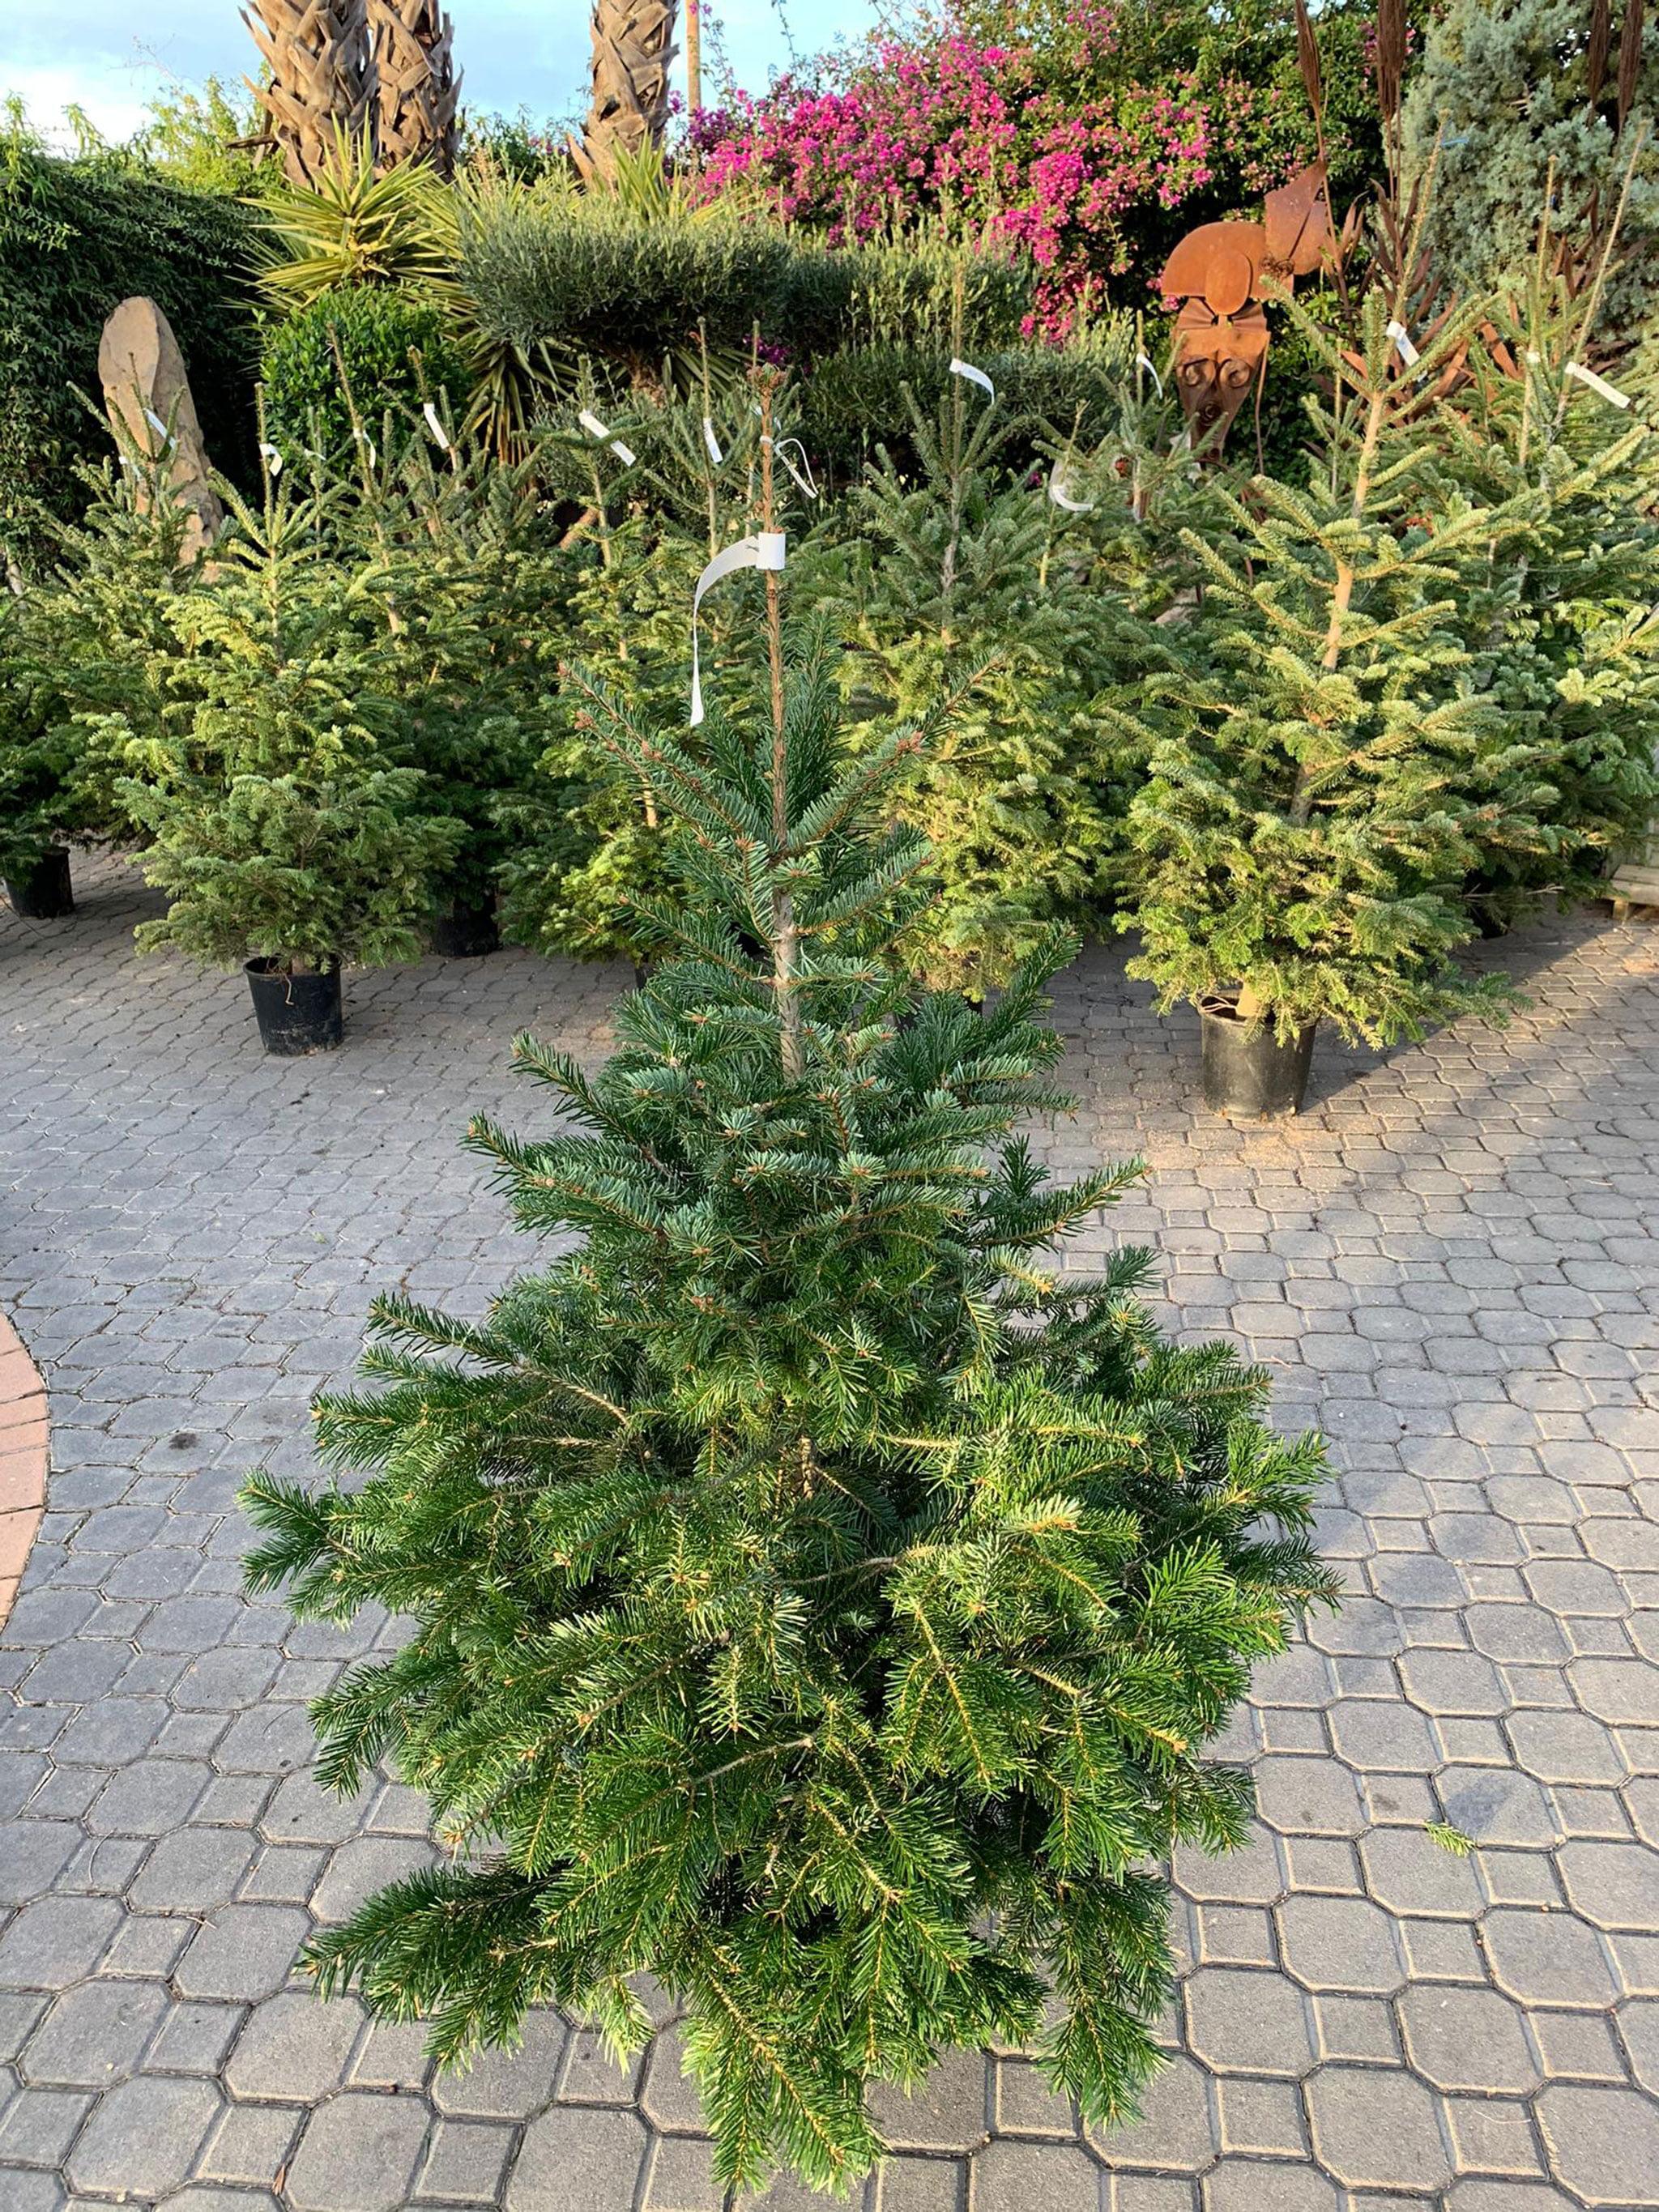 Natura Garden offre un sapin naturel pour ce Noël